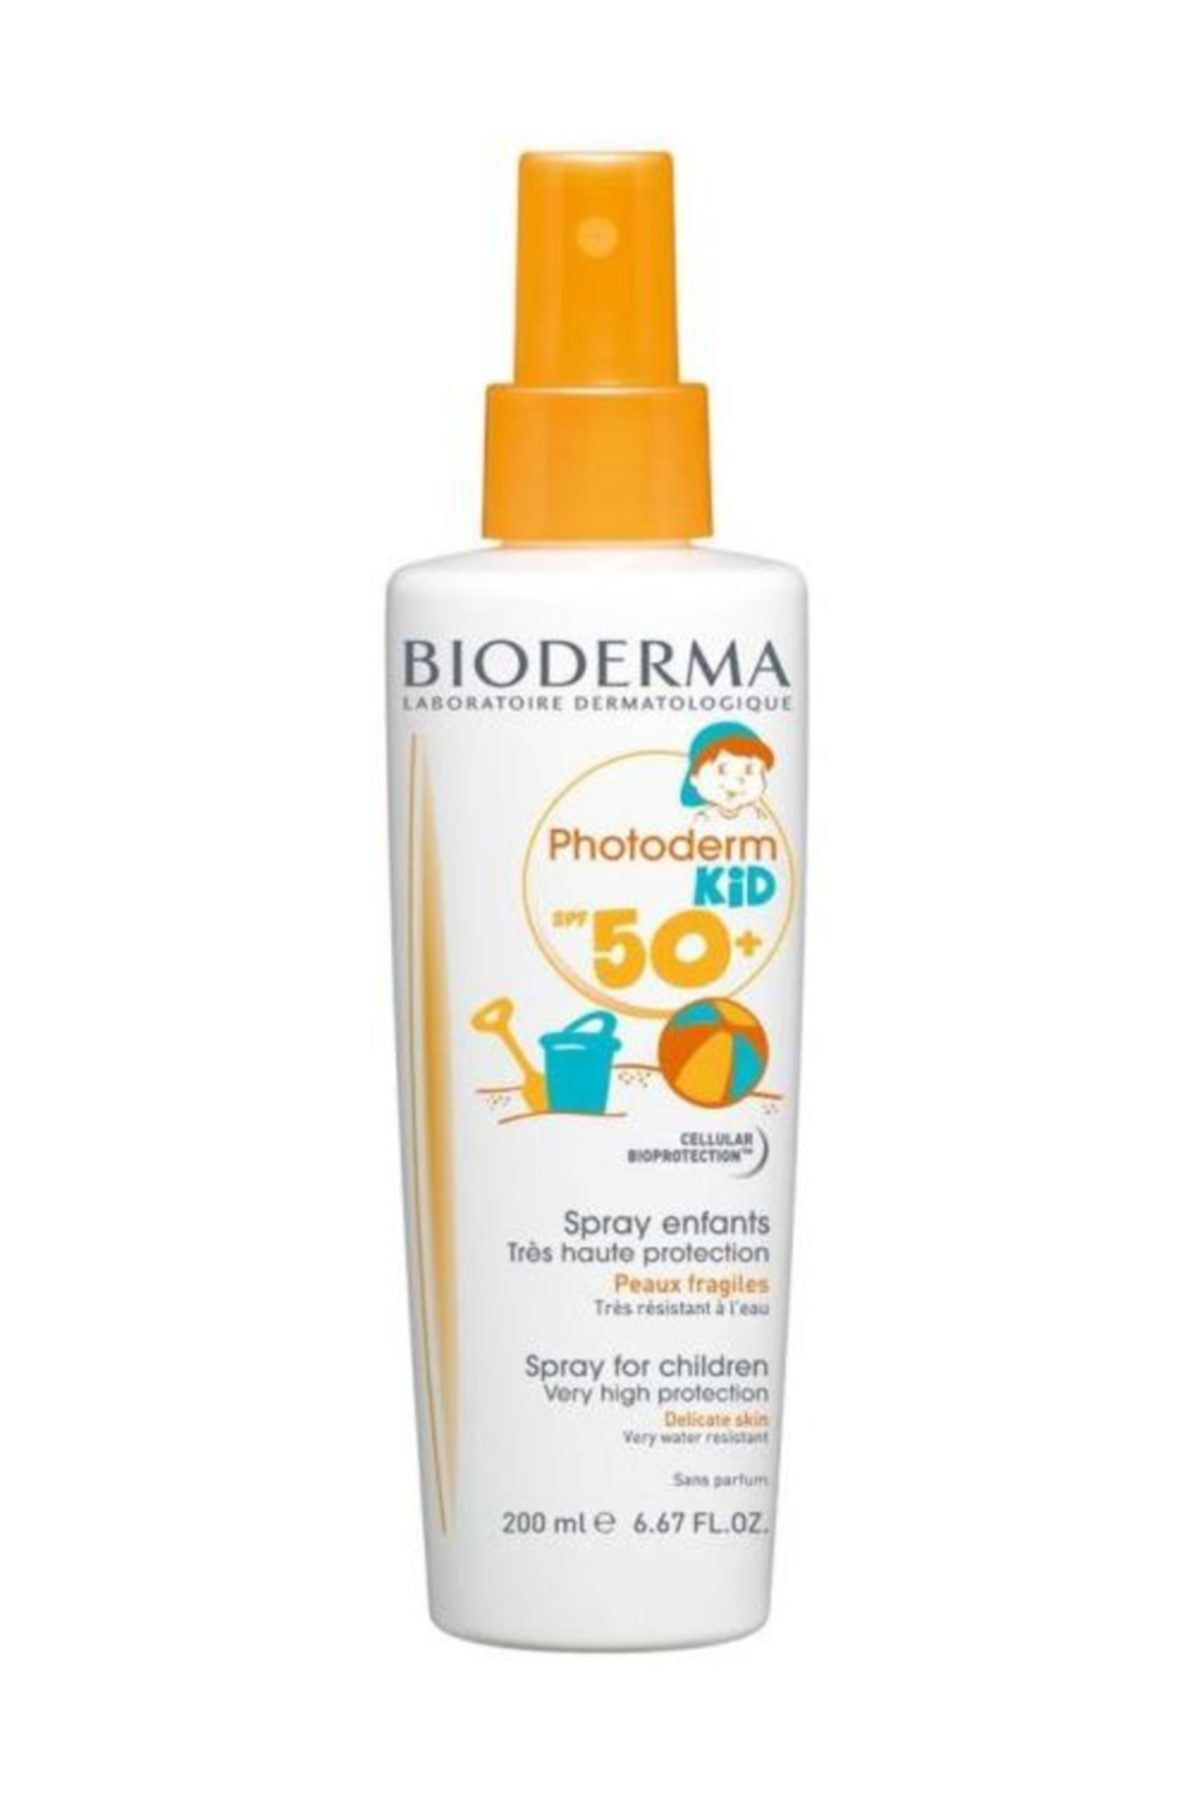 Bioderma Photoderm Kid SPF50+ Spray 200 ml 1